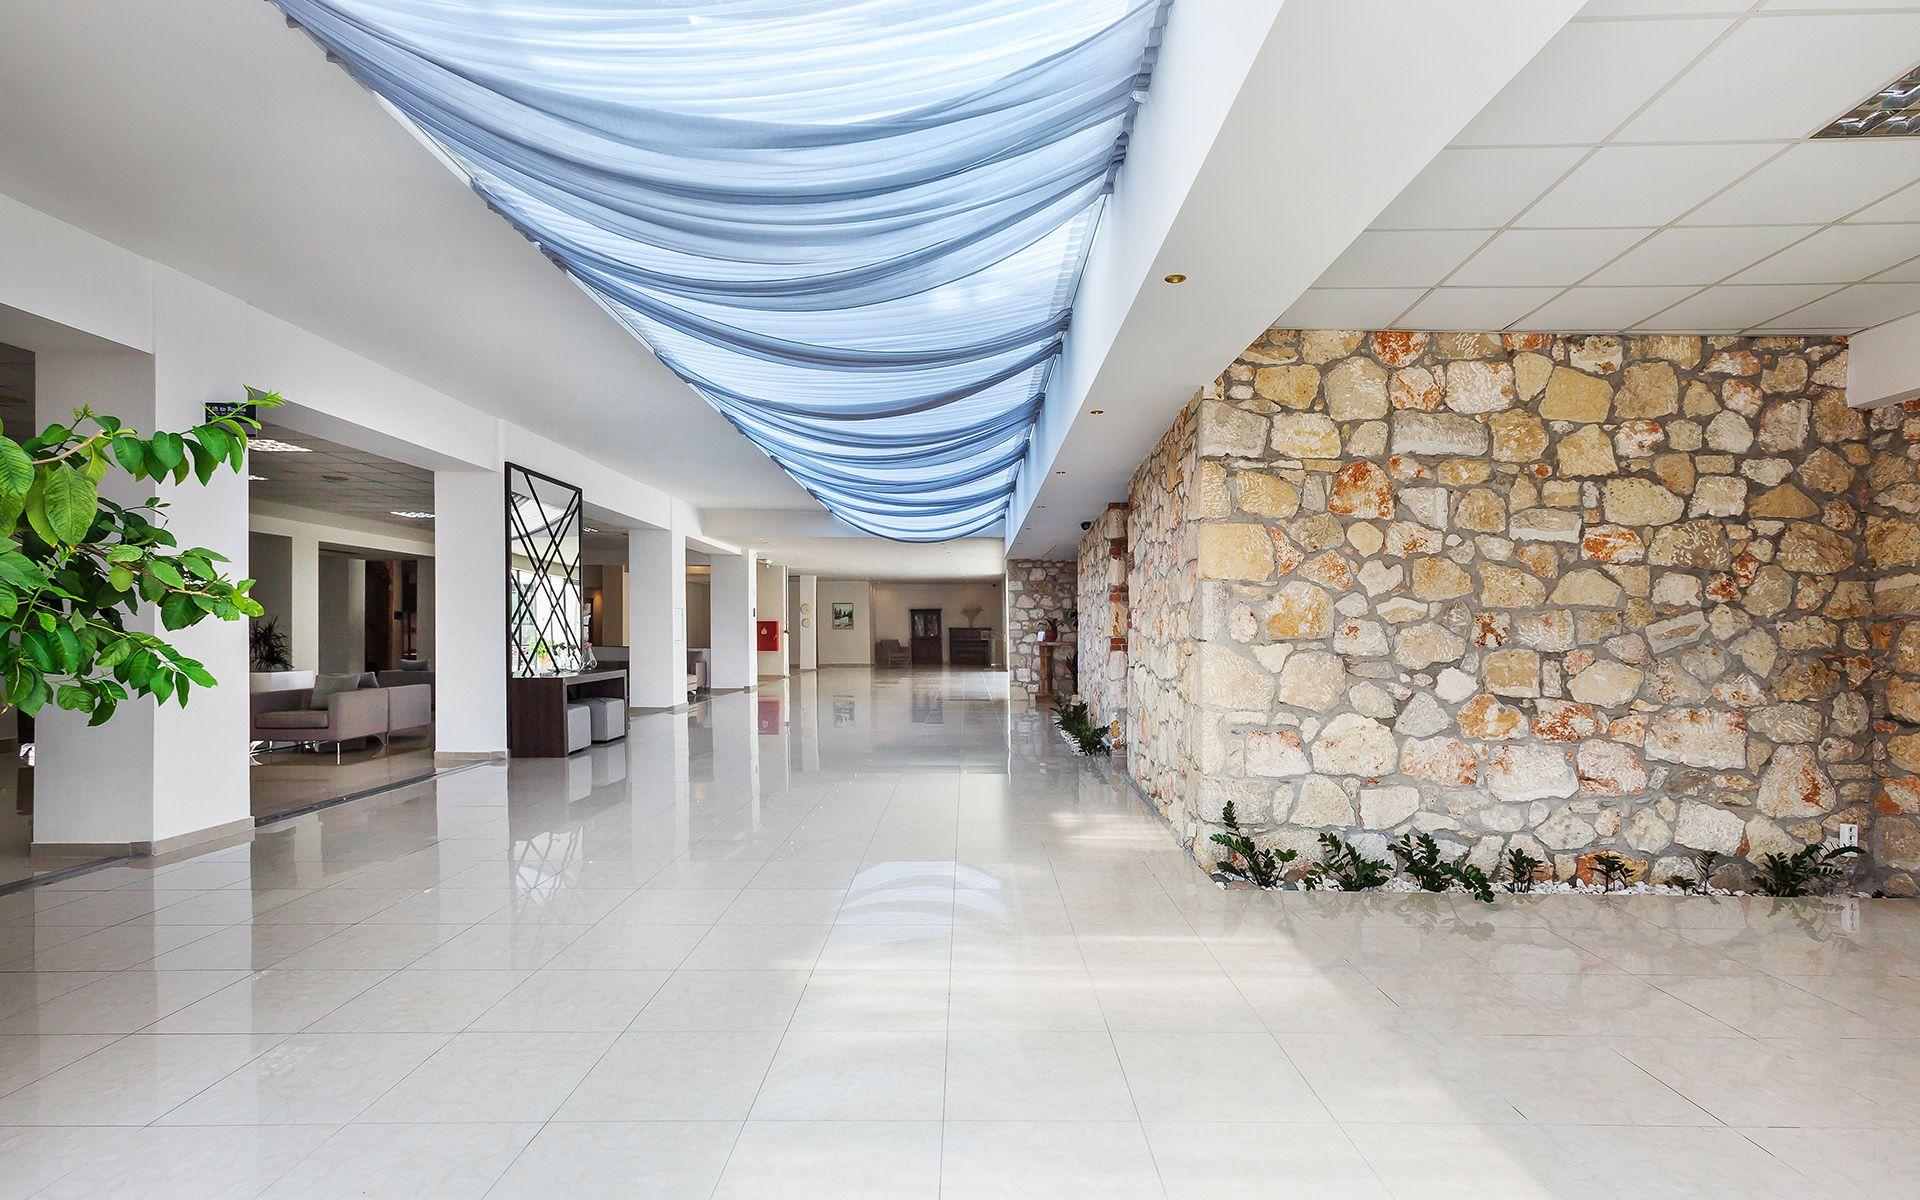 Kriopigi Hotel Chalkidiki